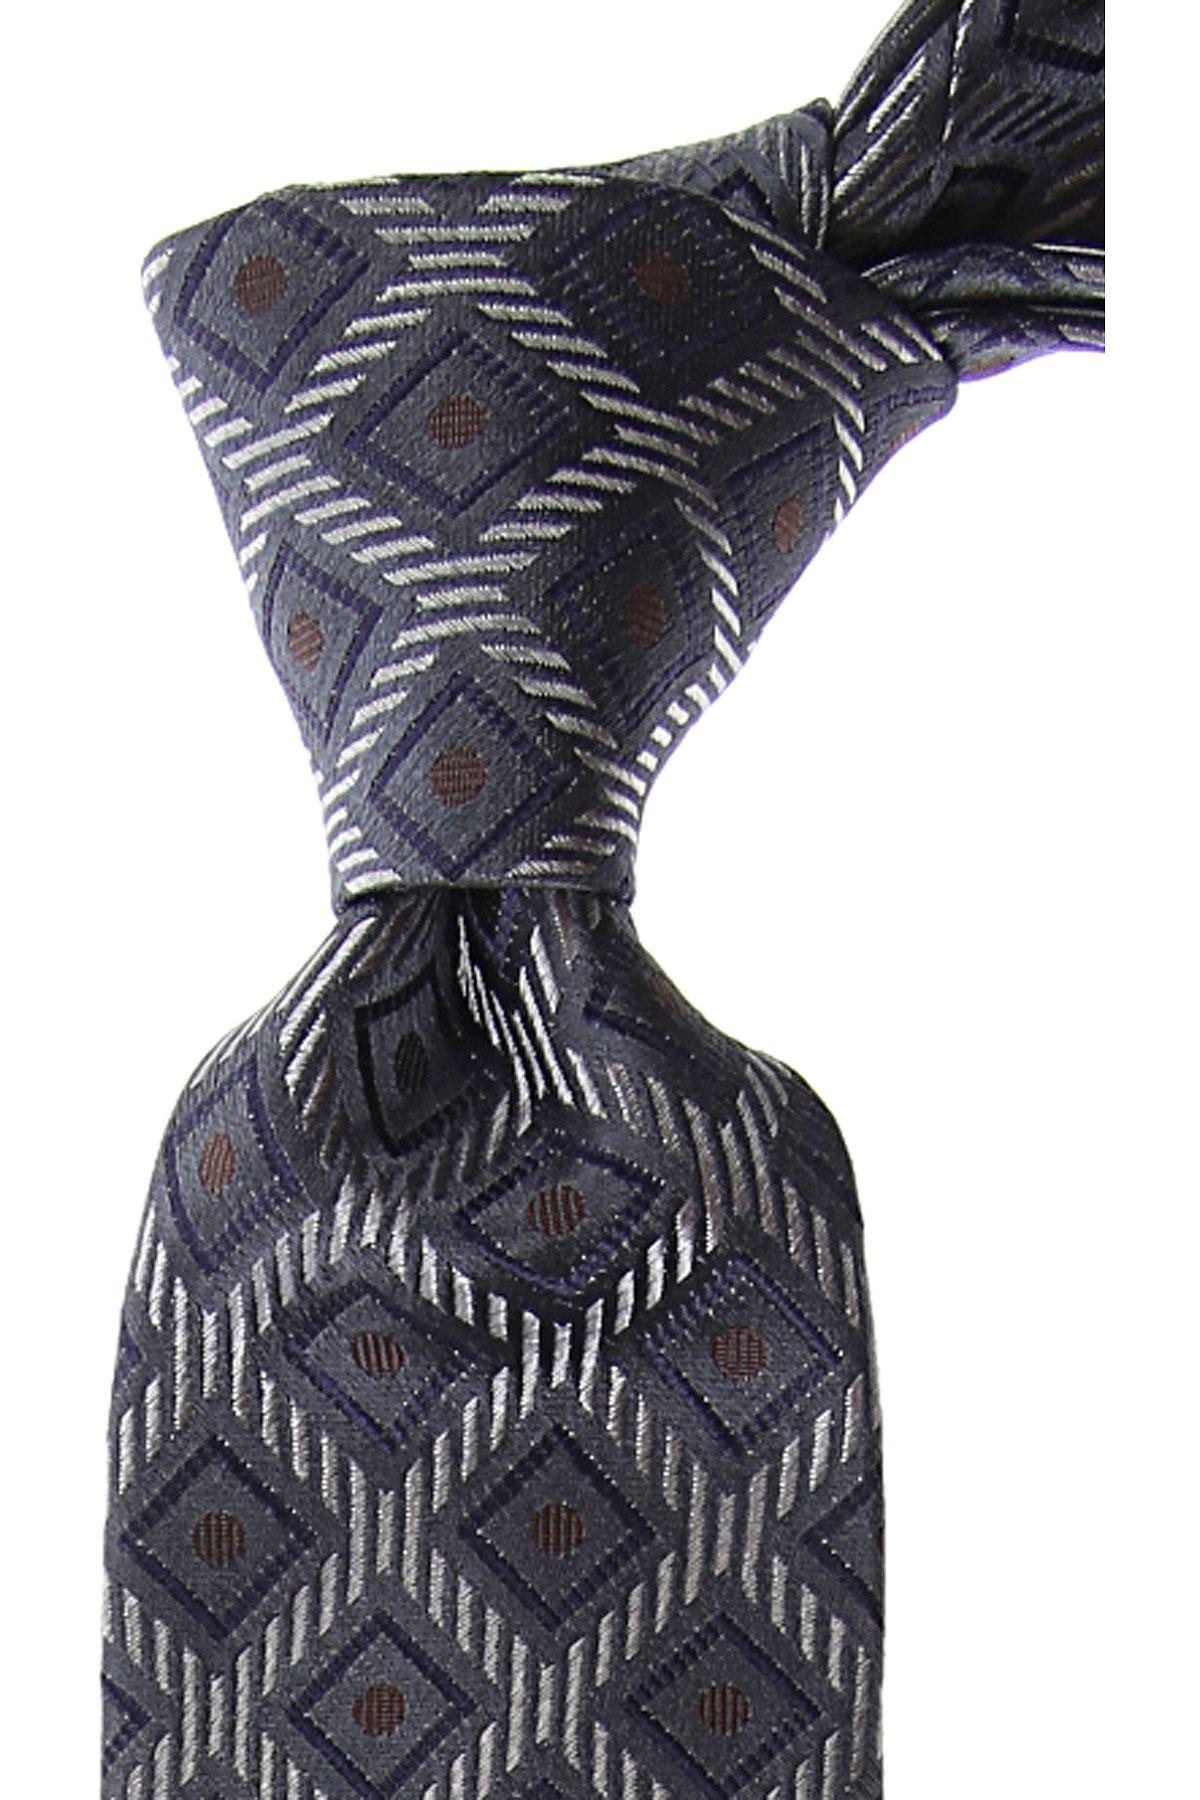 Moschino Cravates Pas cher en Soldes, Anthracite, Soie, 2019